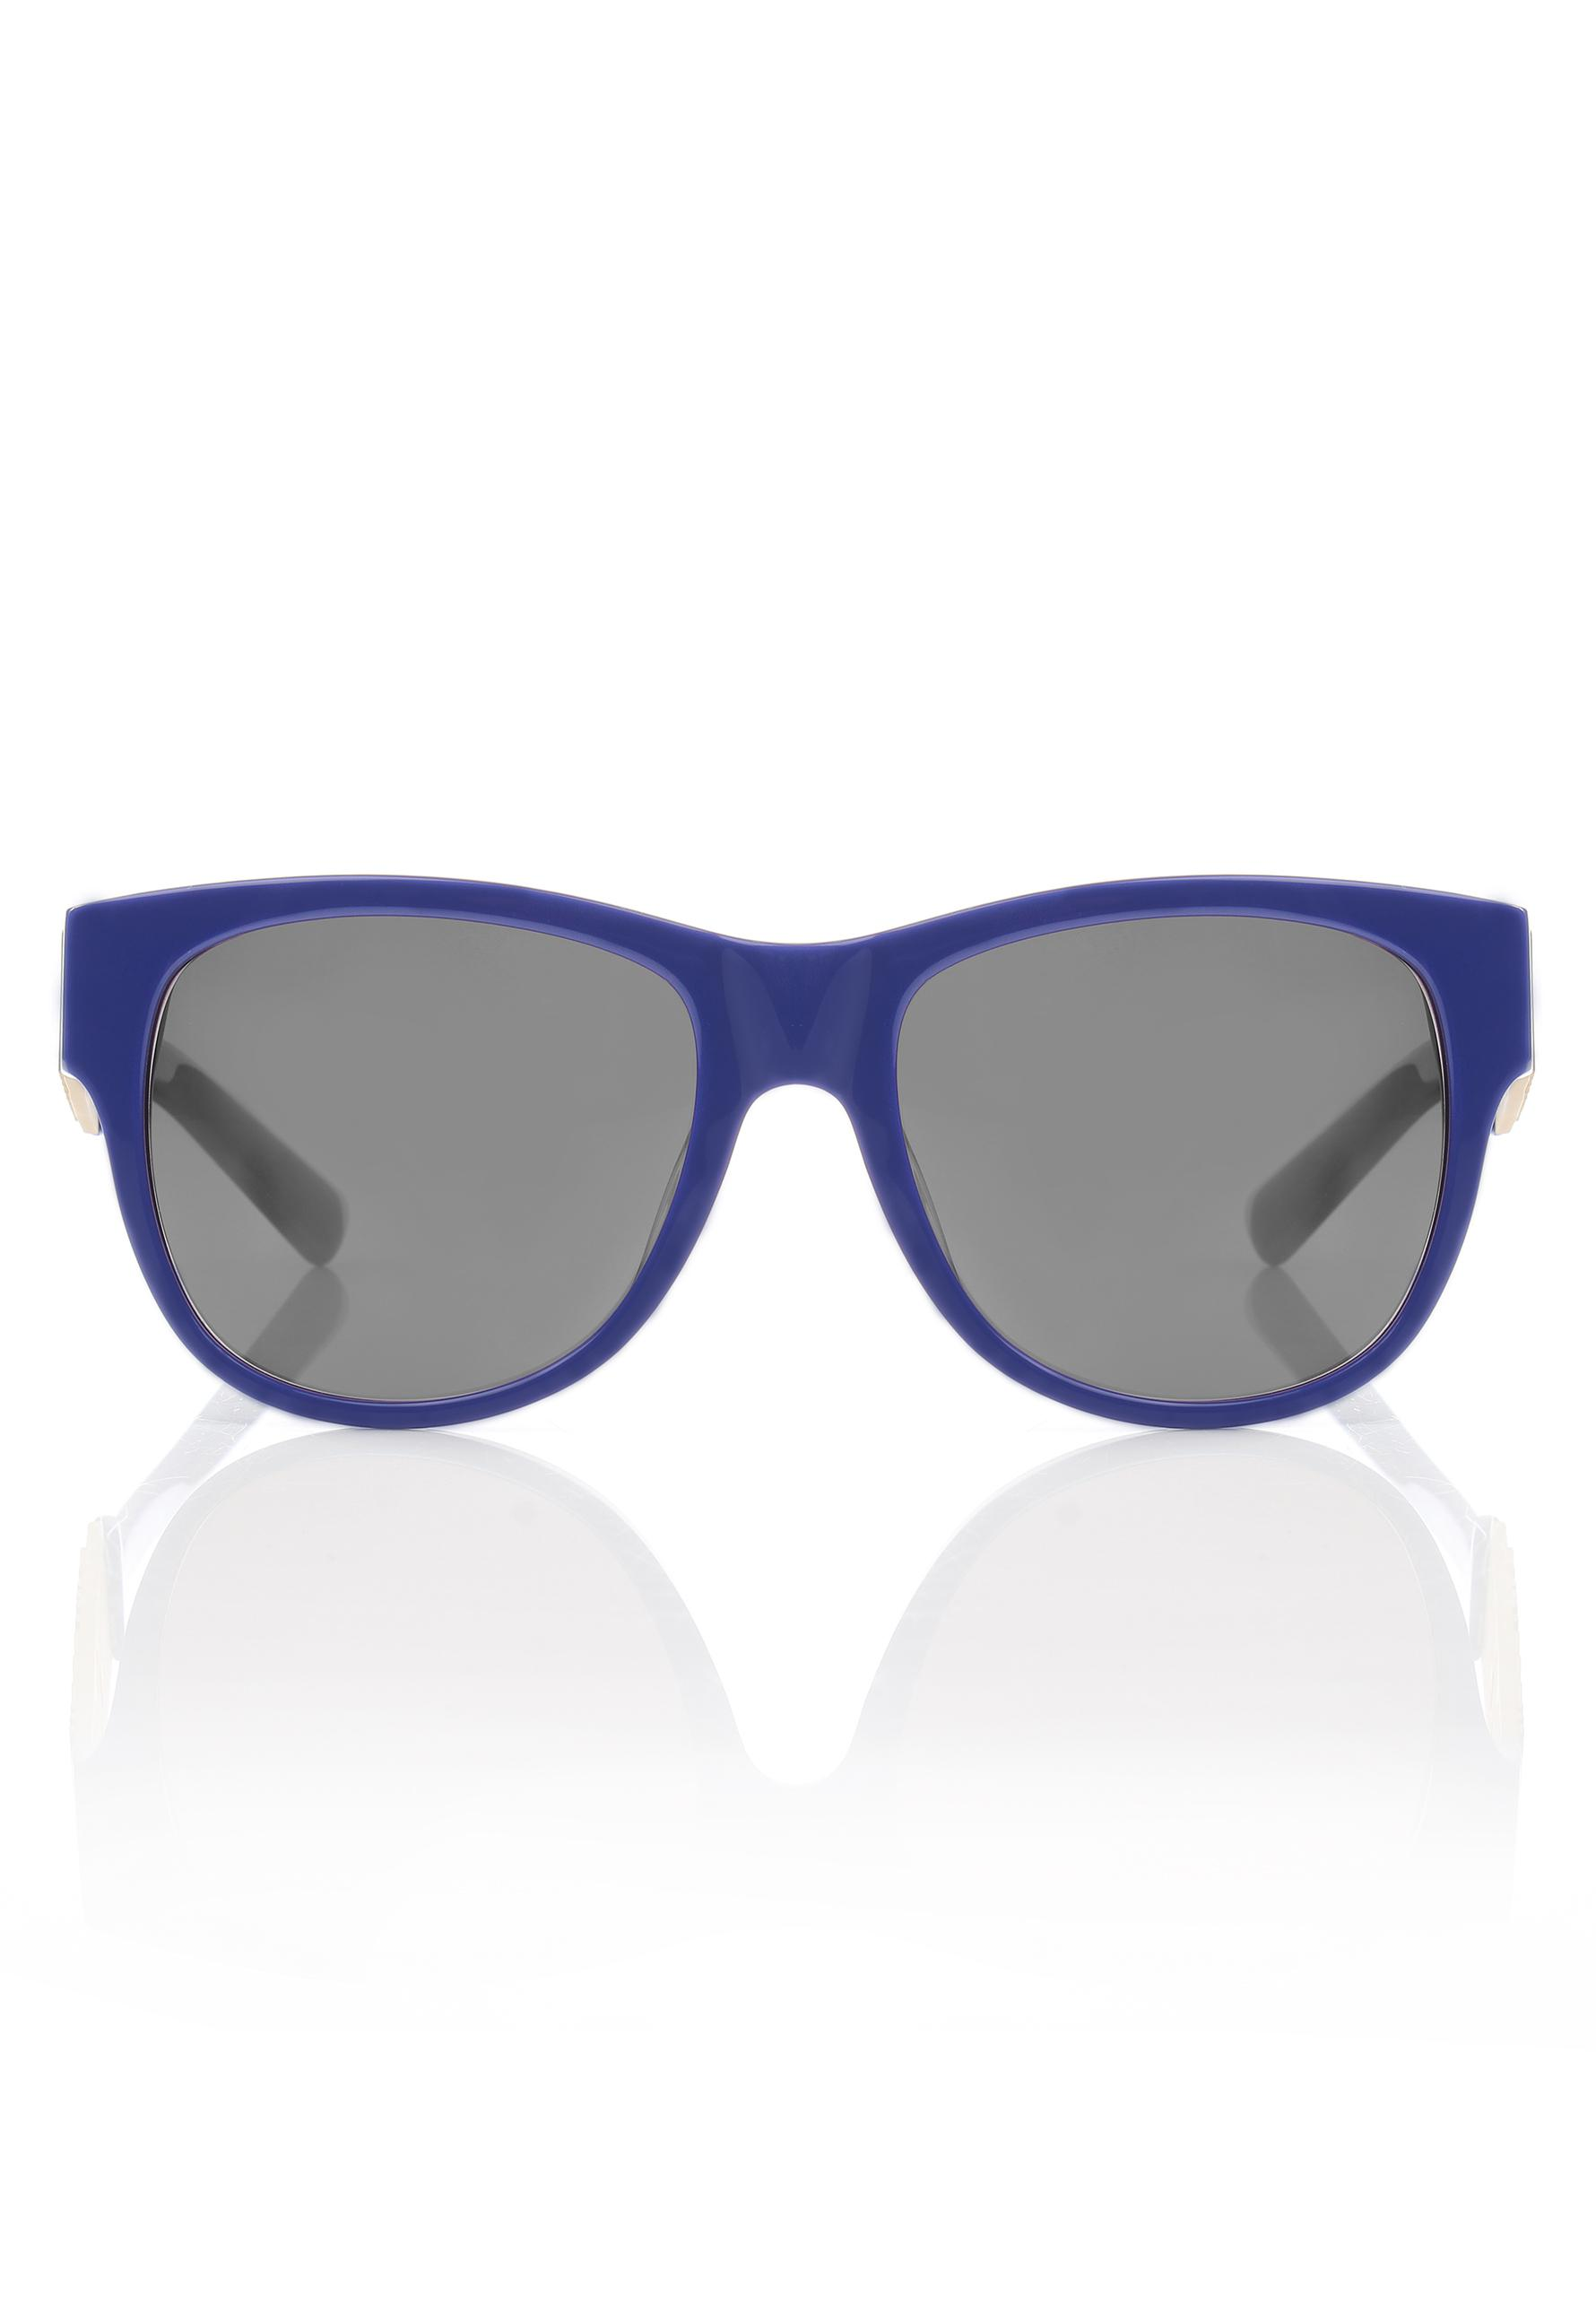 f7d43c3dbda6d Moschino Large Logo Wayfarer Sunglasses Blue grey Lens in Blue - Lyst